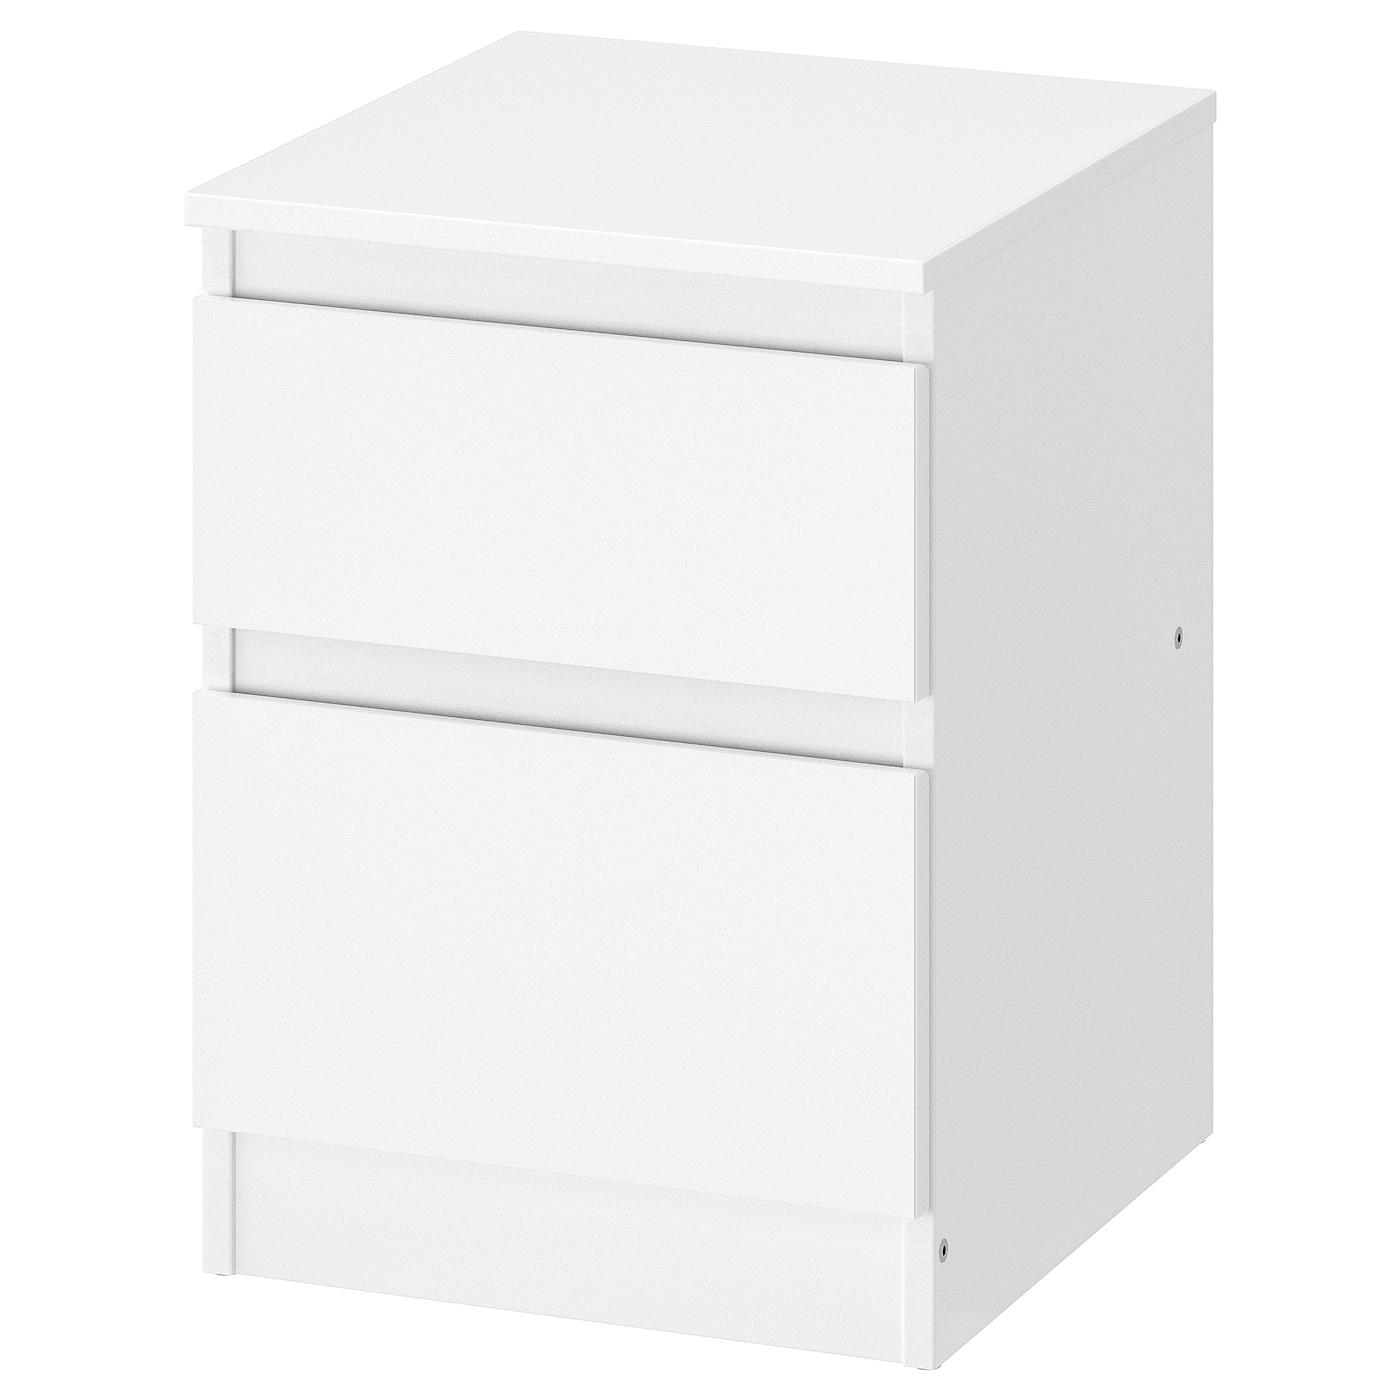 2 X IKEA Kullen Chest of 2 Drawers